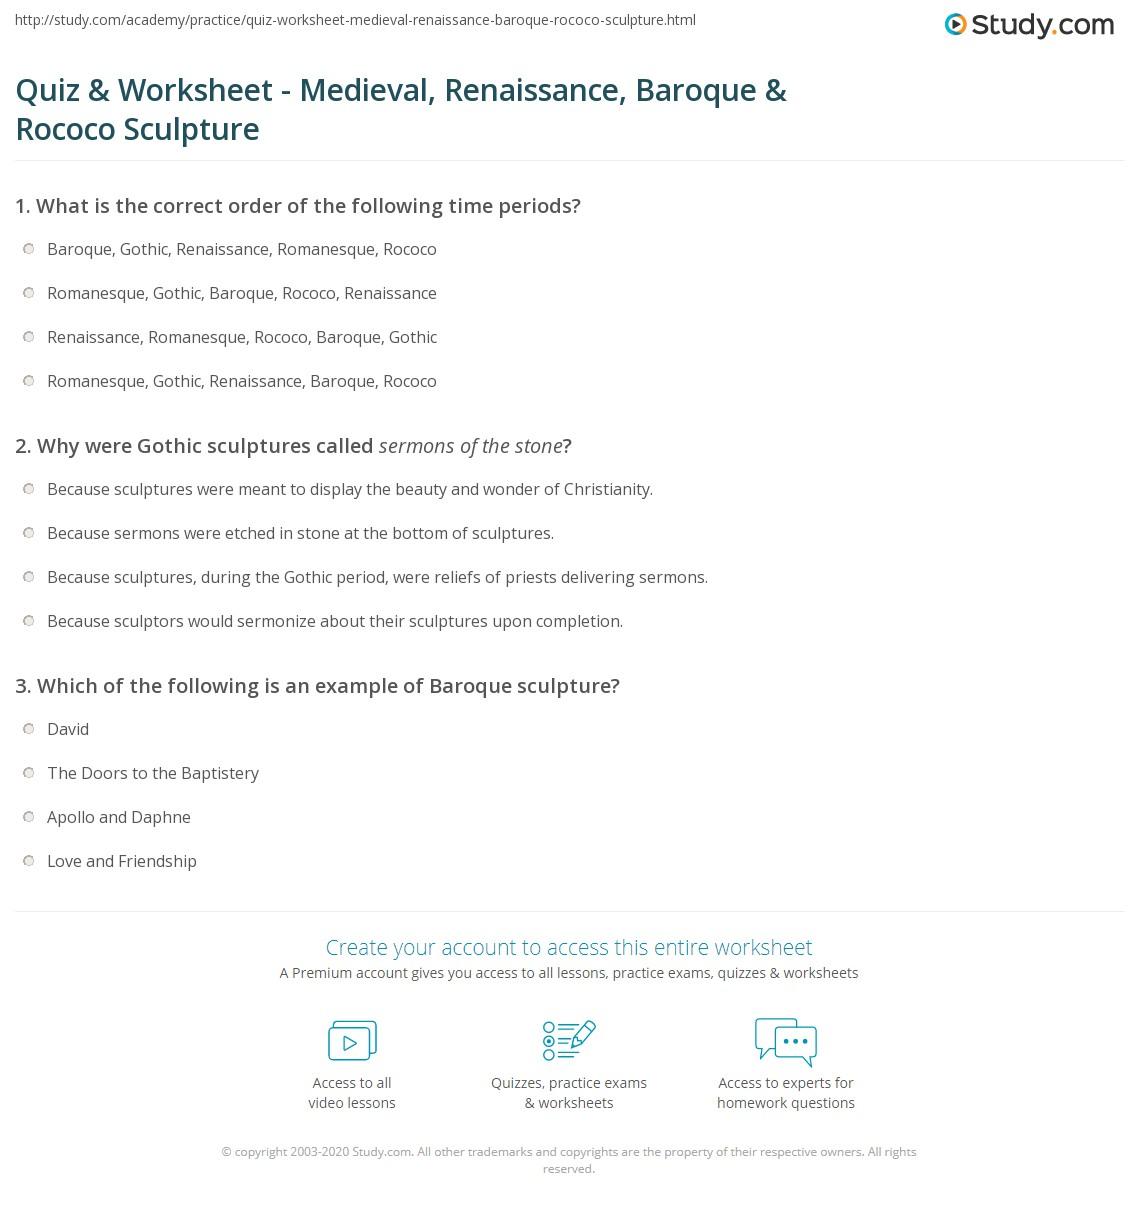 Quiz Worksheet Medieval Renaissance Baroque Rococo – Renaissance Worksheet